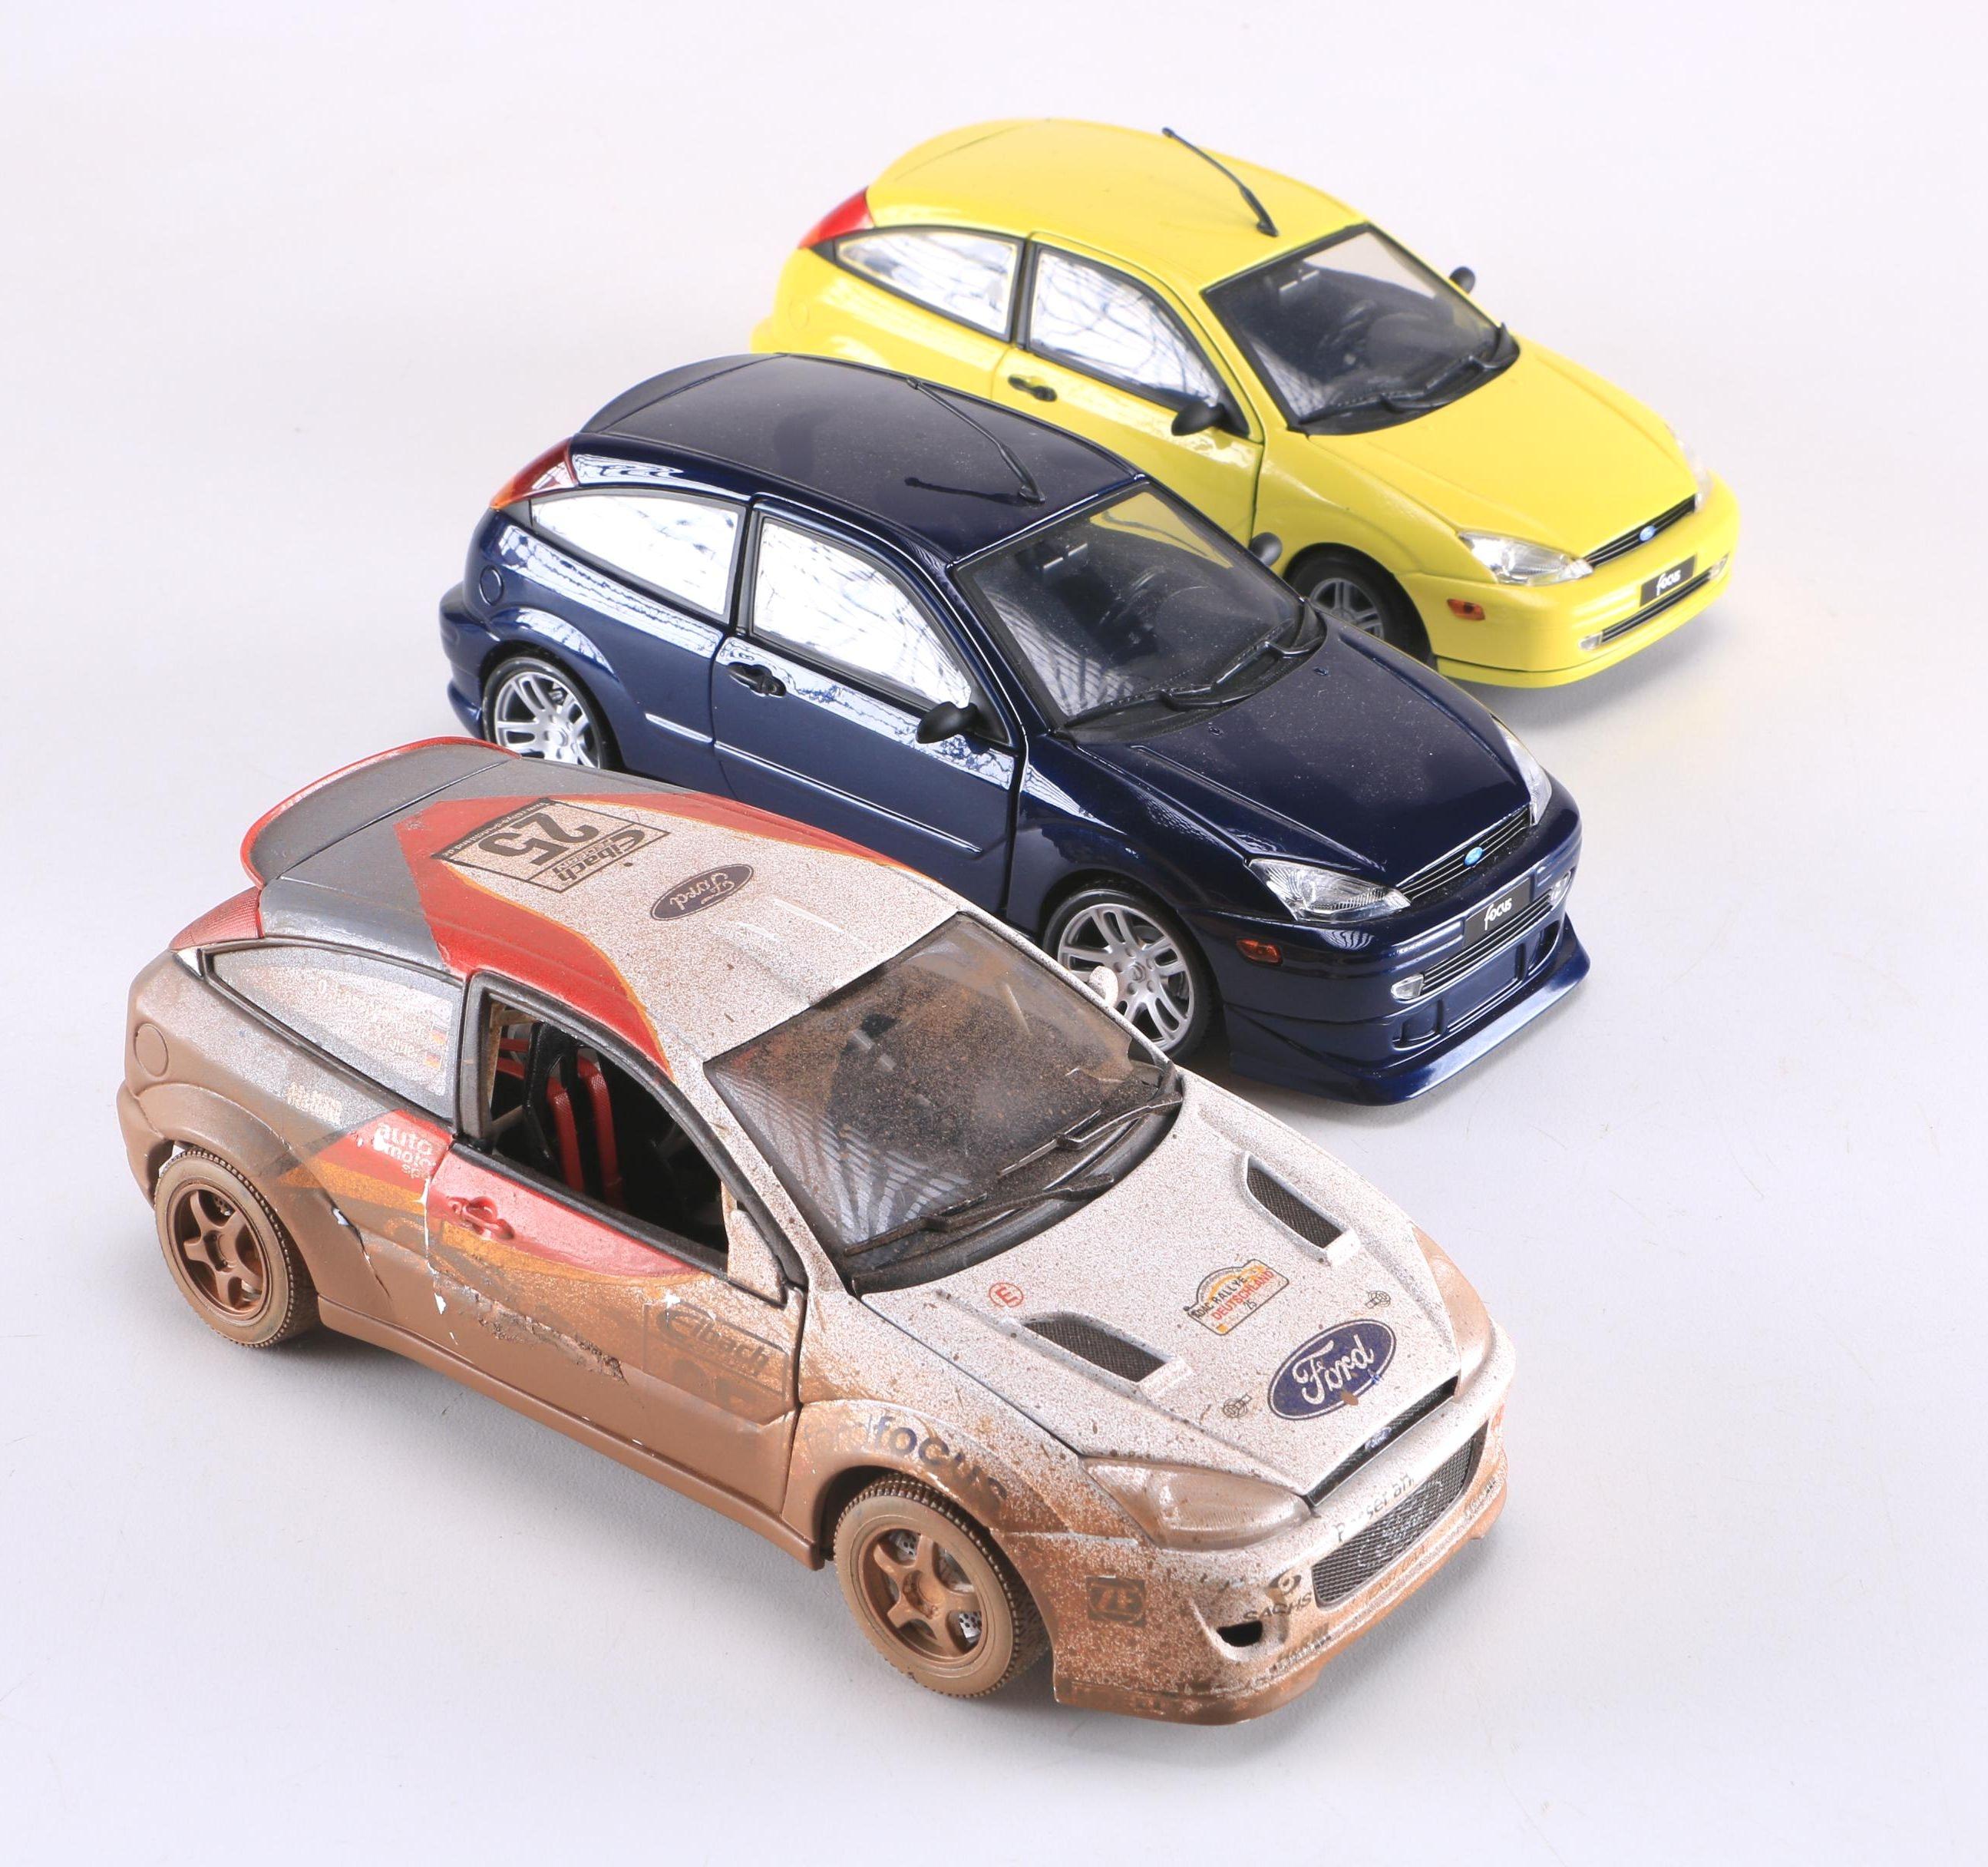 Ford Focus Die-Cast Cars